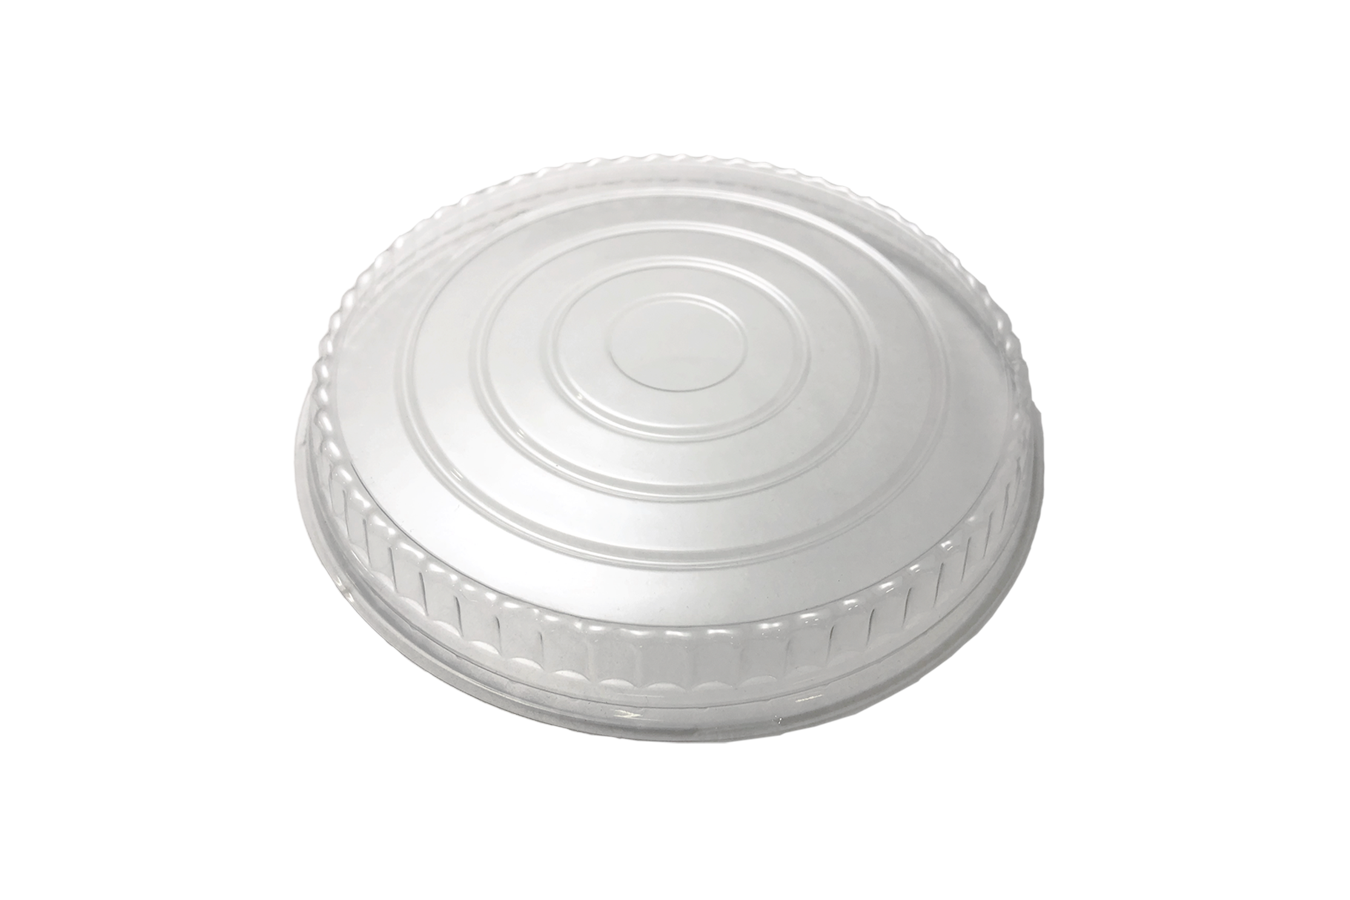 Line art illustration of clear transparent plastic non-vented lid for Ecopax 24 oz Athena paper bowl